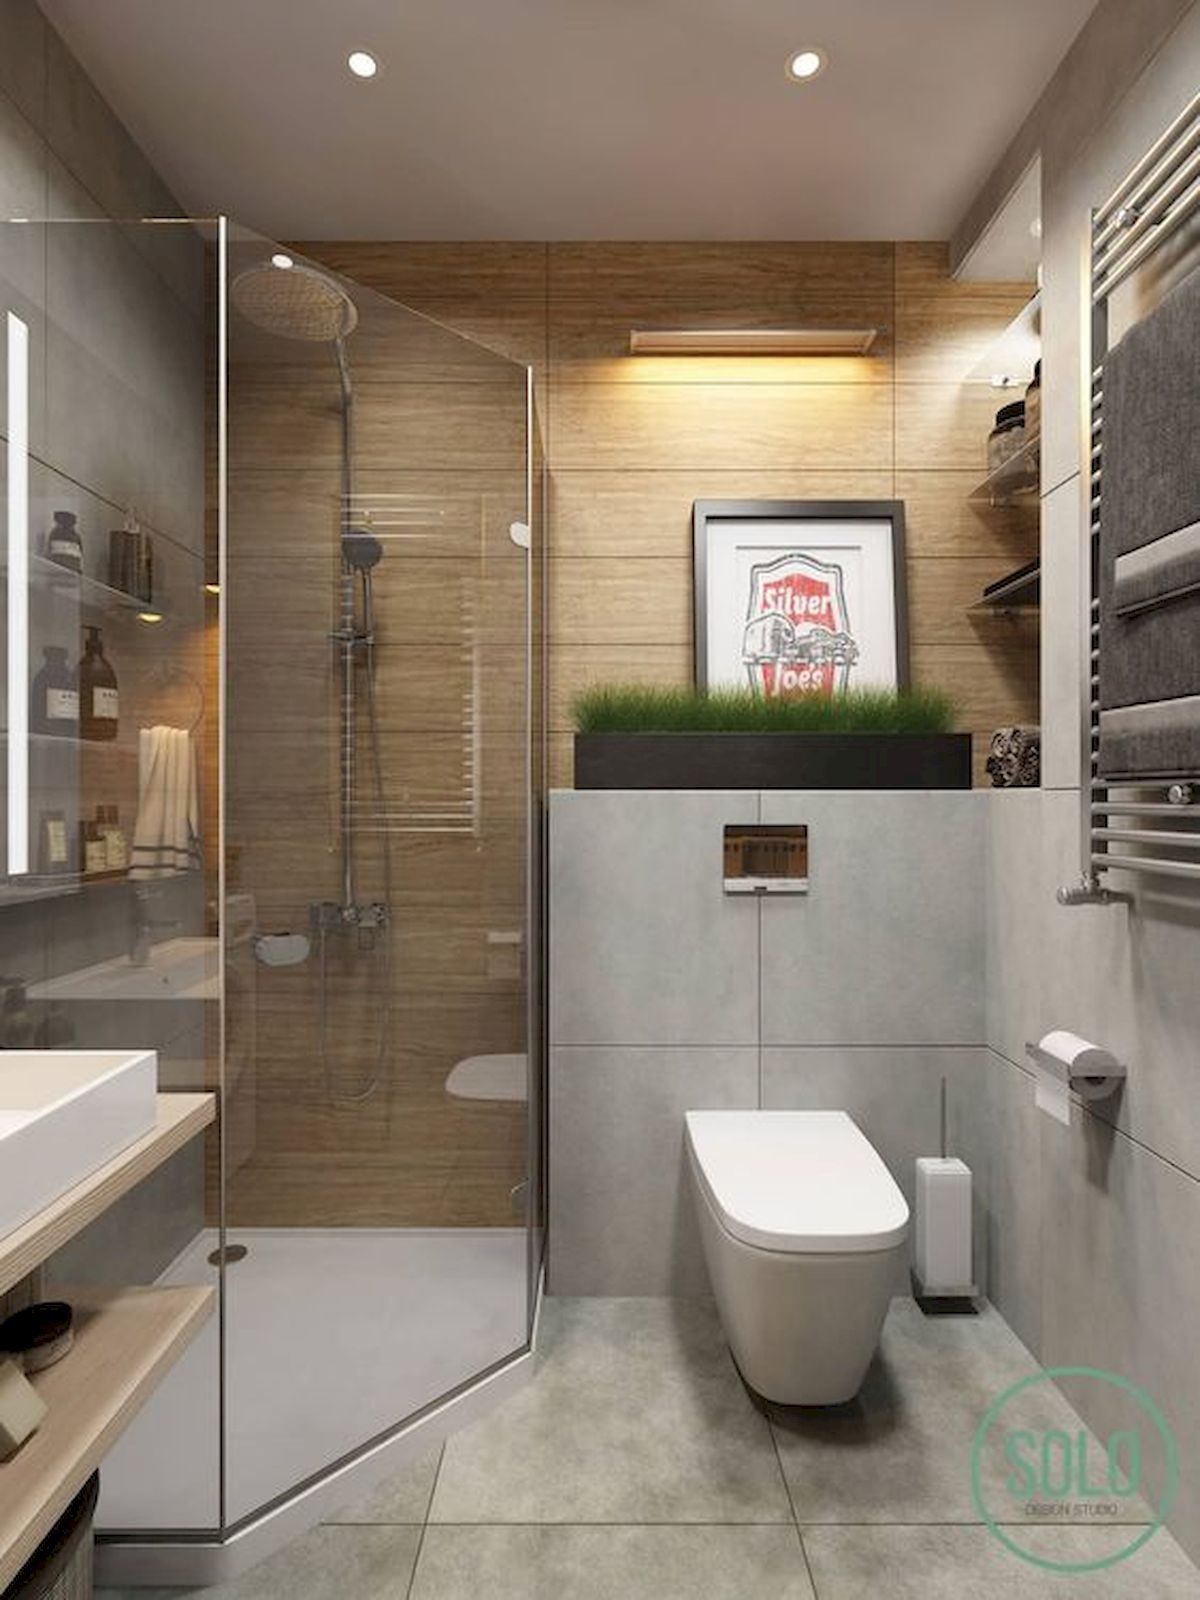 33 Ideas For Small Bathroom (1 in 2020 | Small bathroom makeover, Small  bathroom diy, Small bathroom inspiration